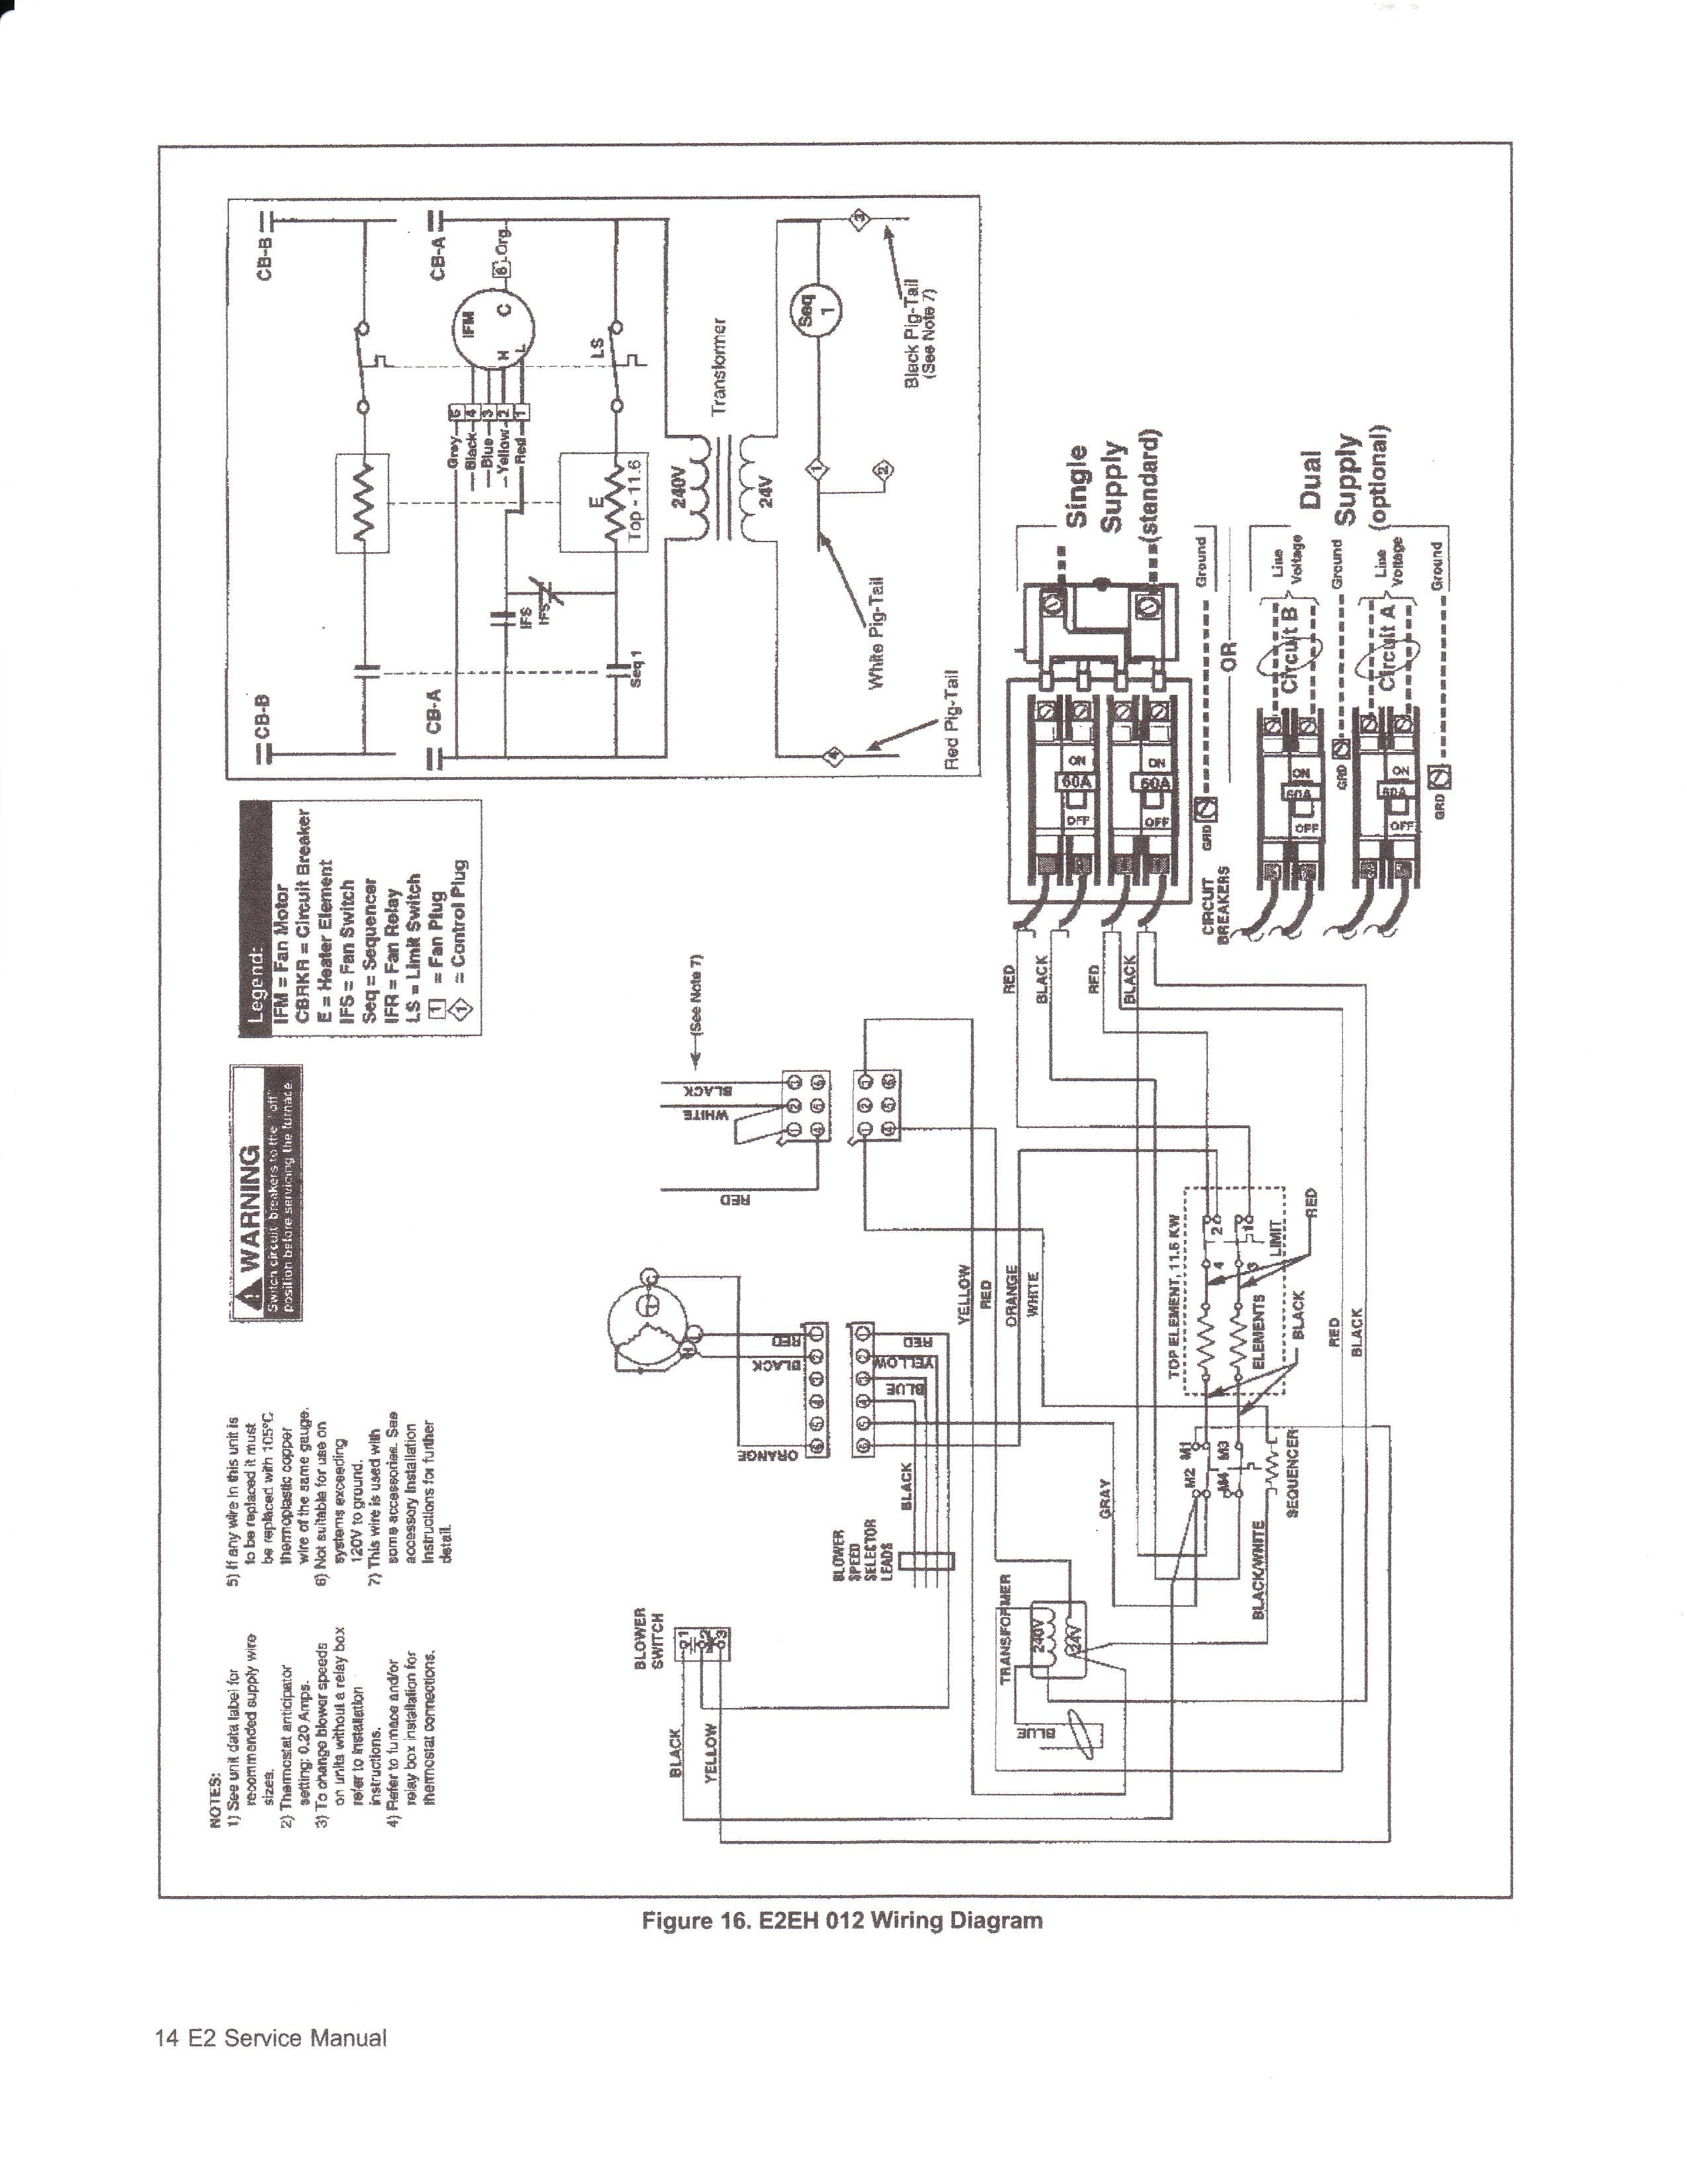 Furnace Transformer Wiring Diagram Janitrol Electric Furnace Wiring Diagram Free Download Wiring Of Furnace Transformer Wiring Diagram